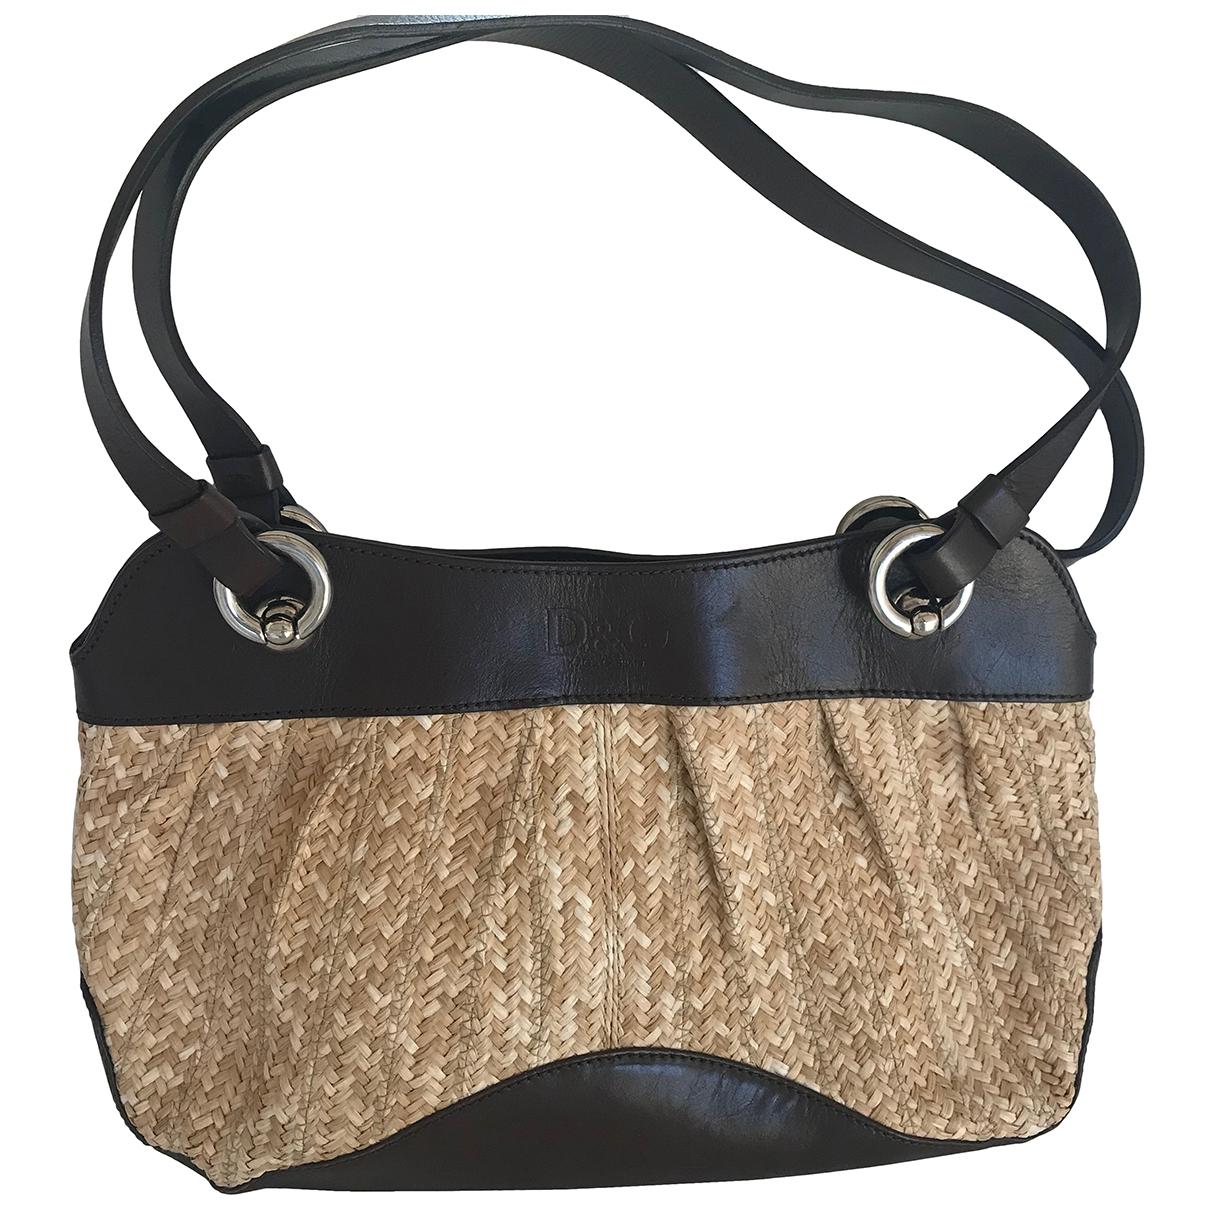 D&g \N Cloth handbag for Women \N